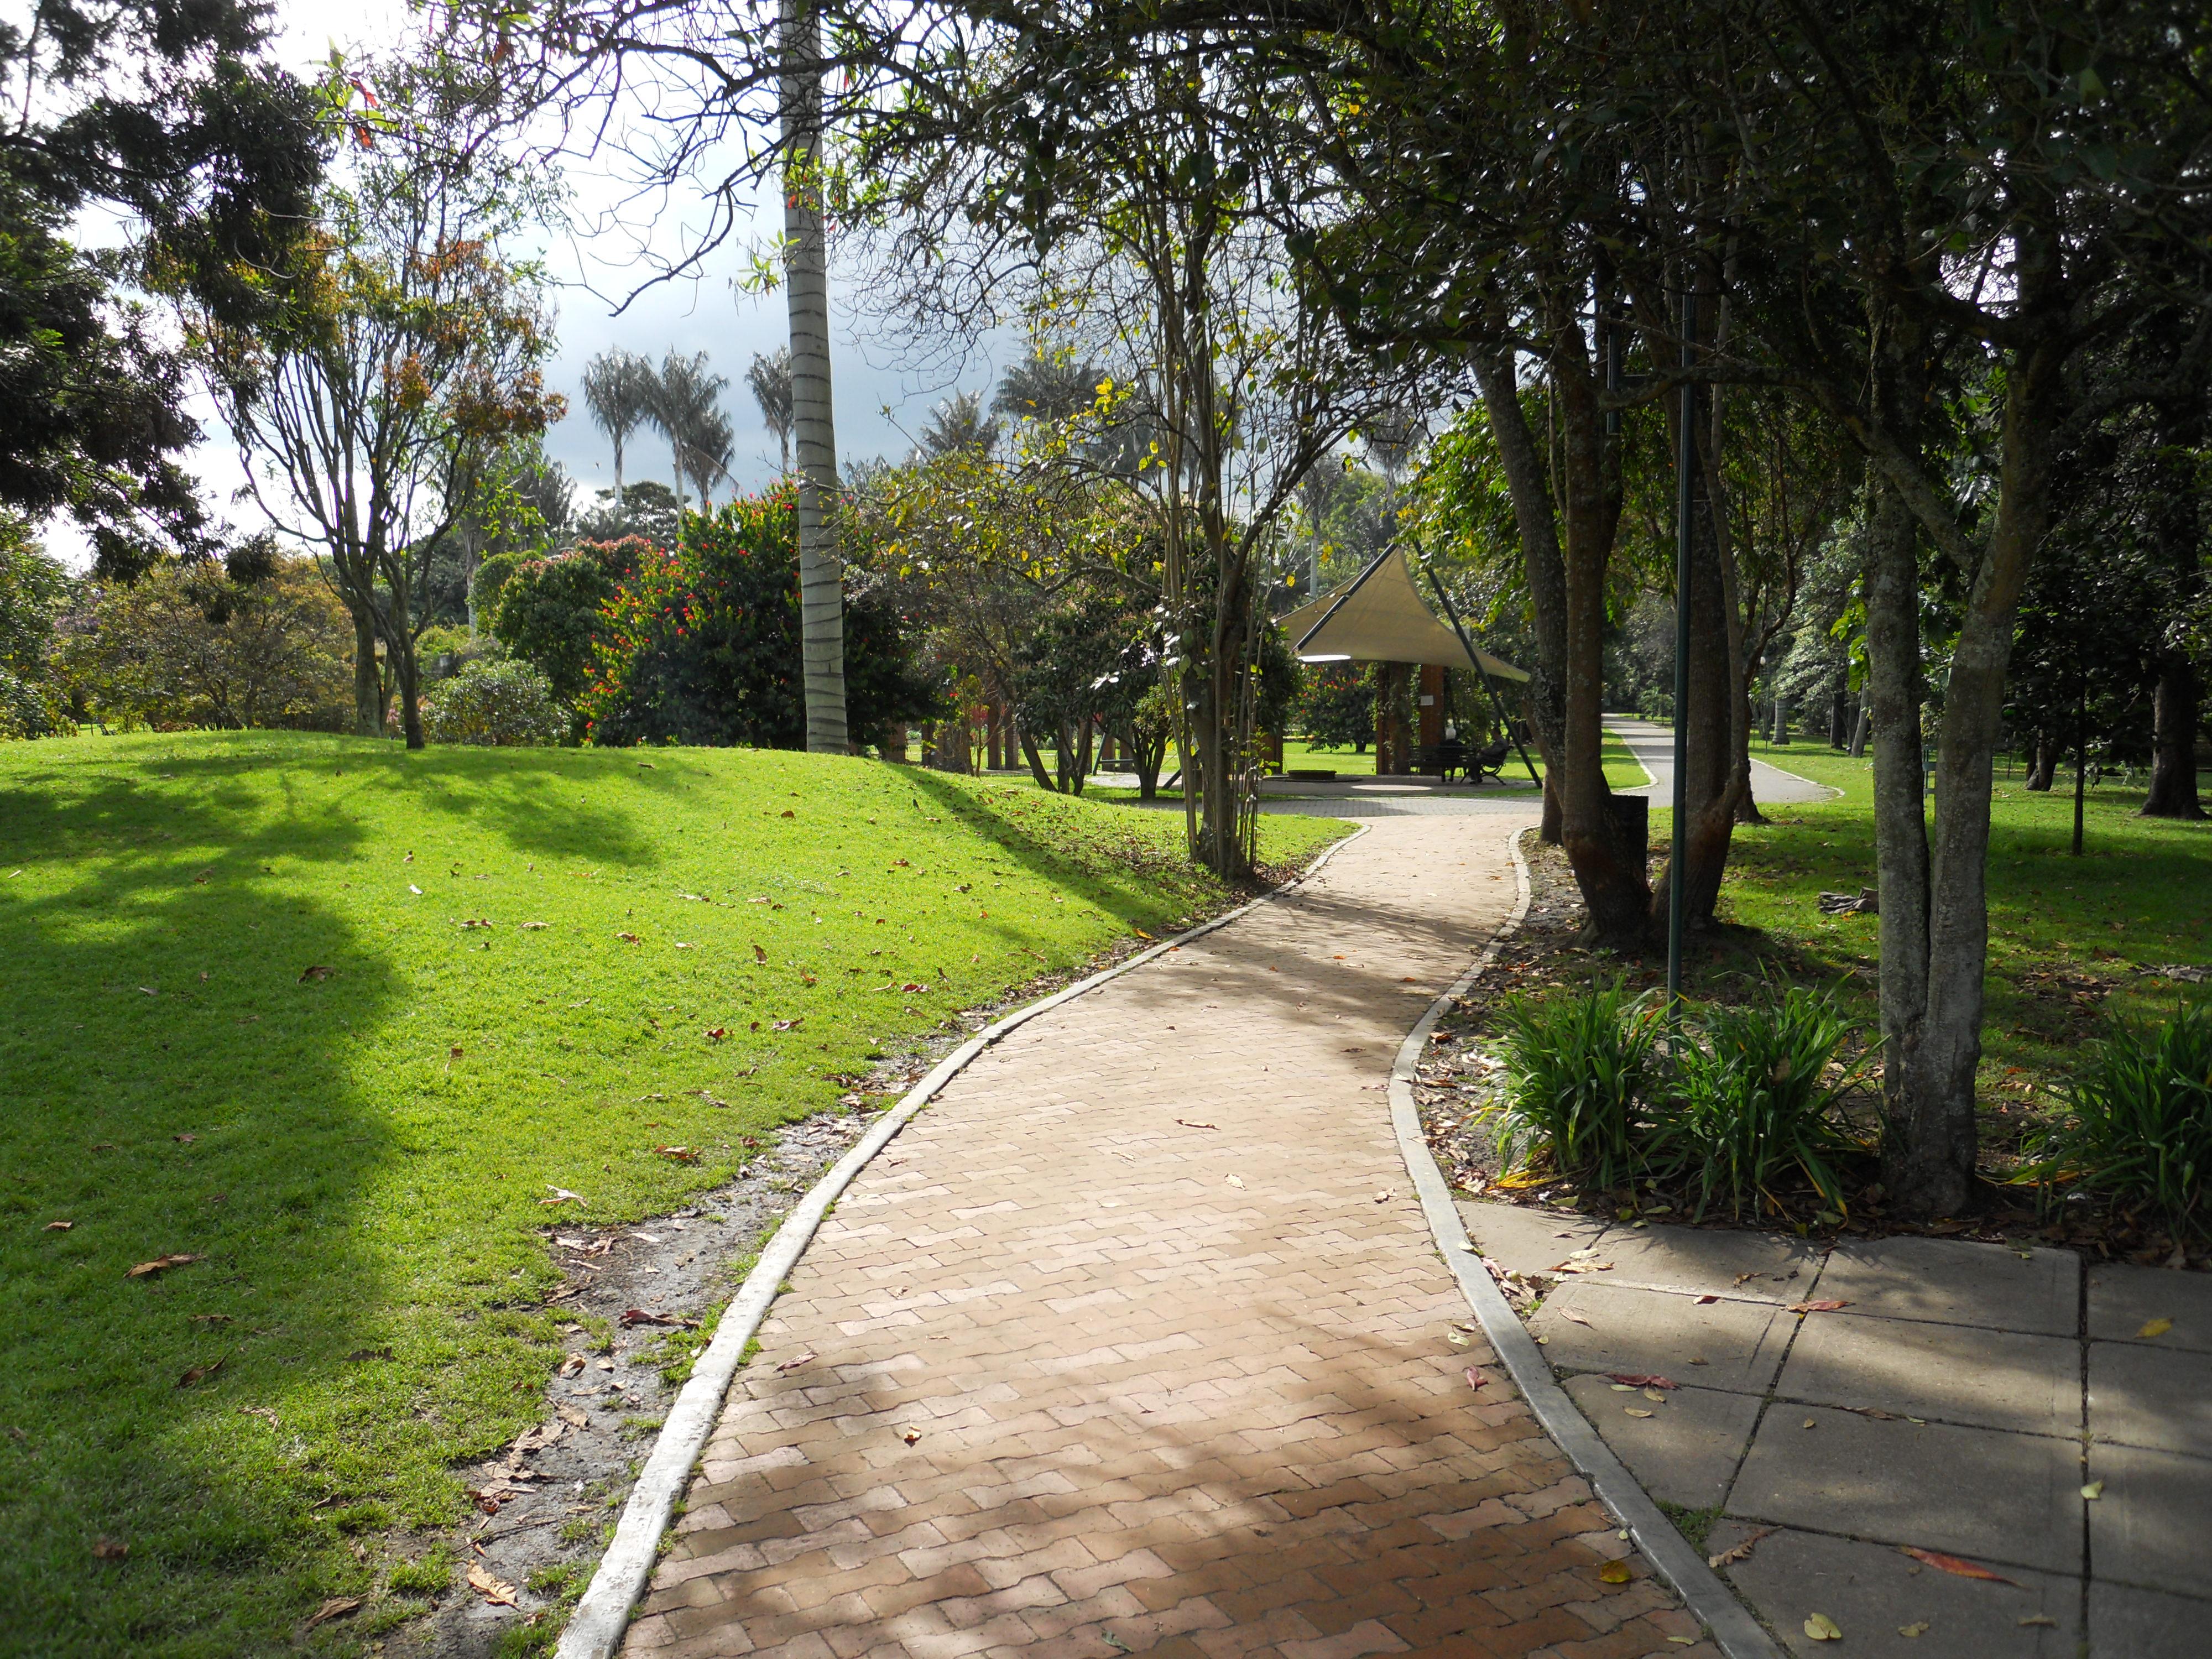 File jard n bot nico de bogot sendero de ladrillo jpg for Barrio ciudad jardin norte bogota